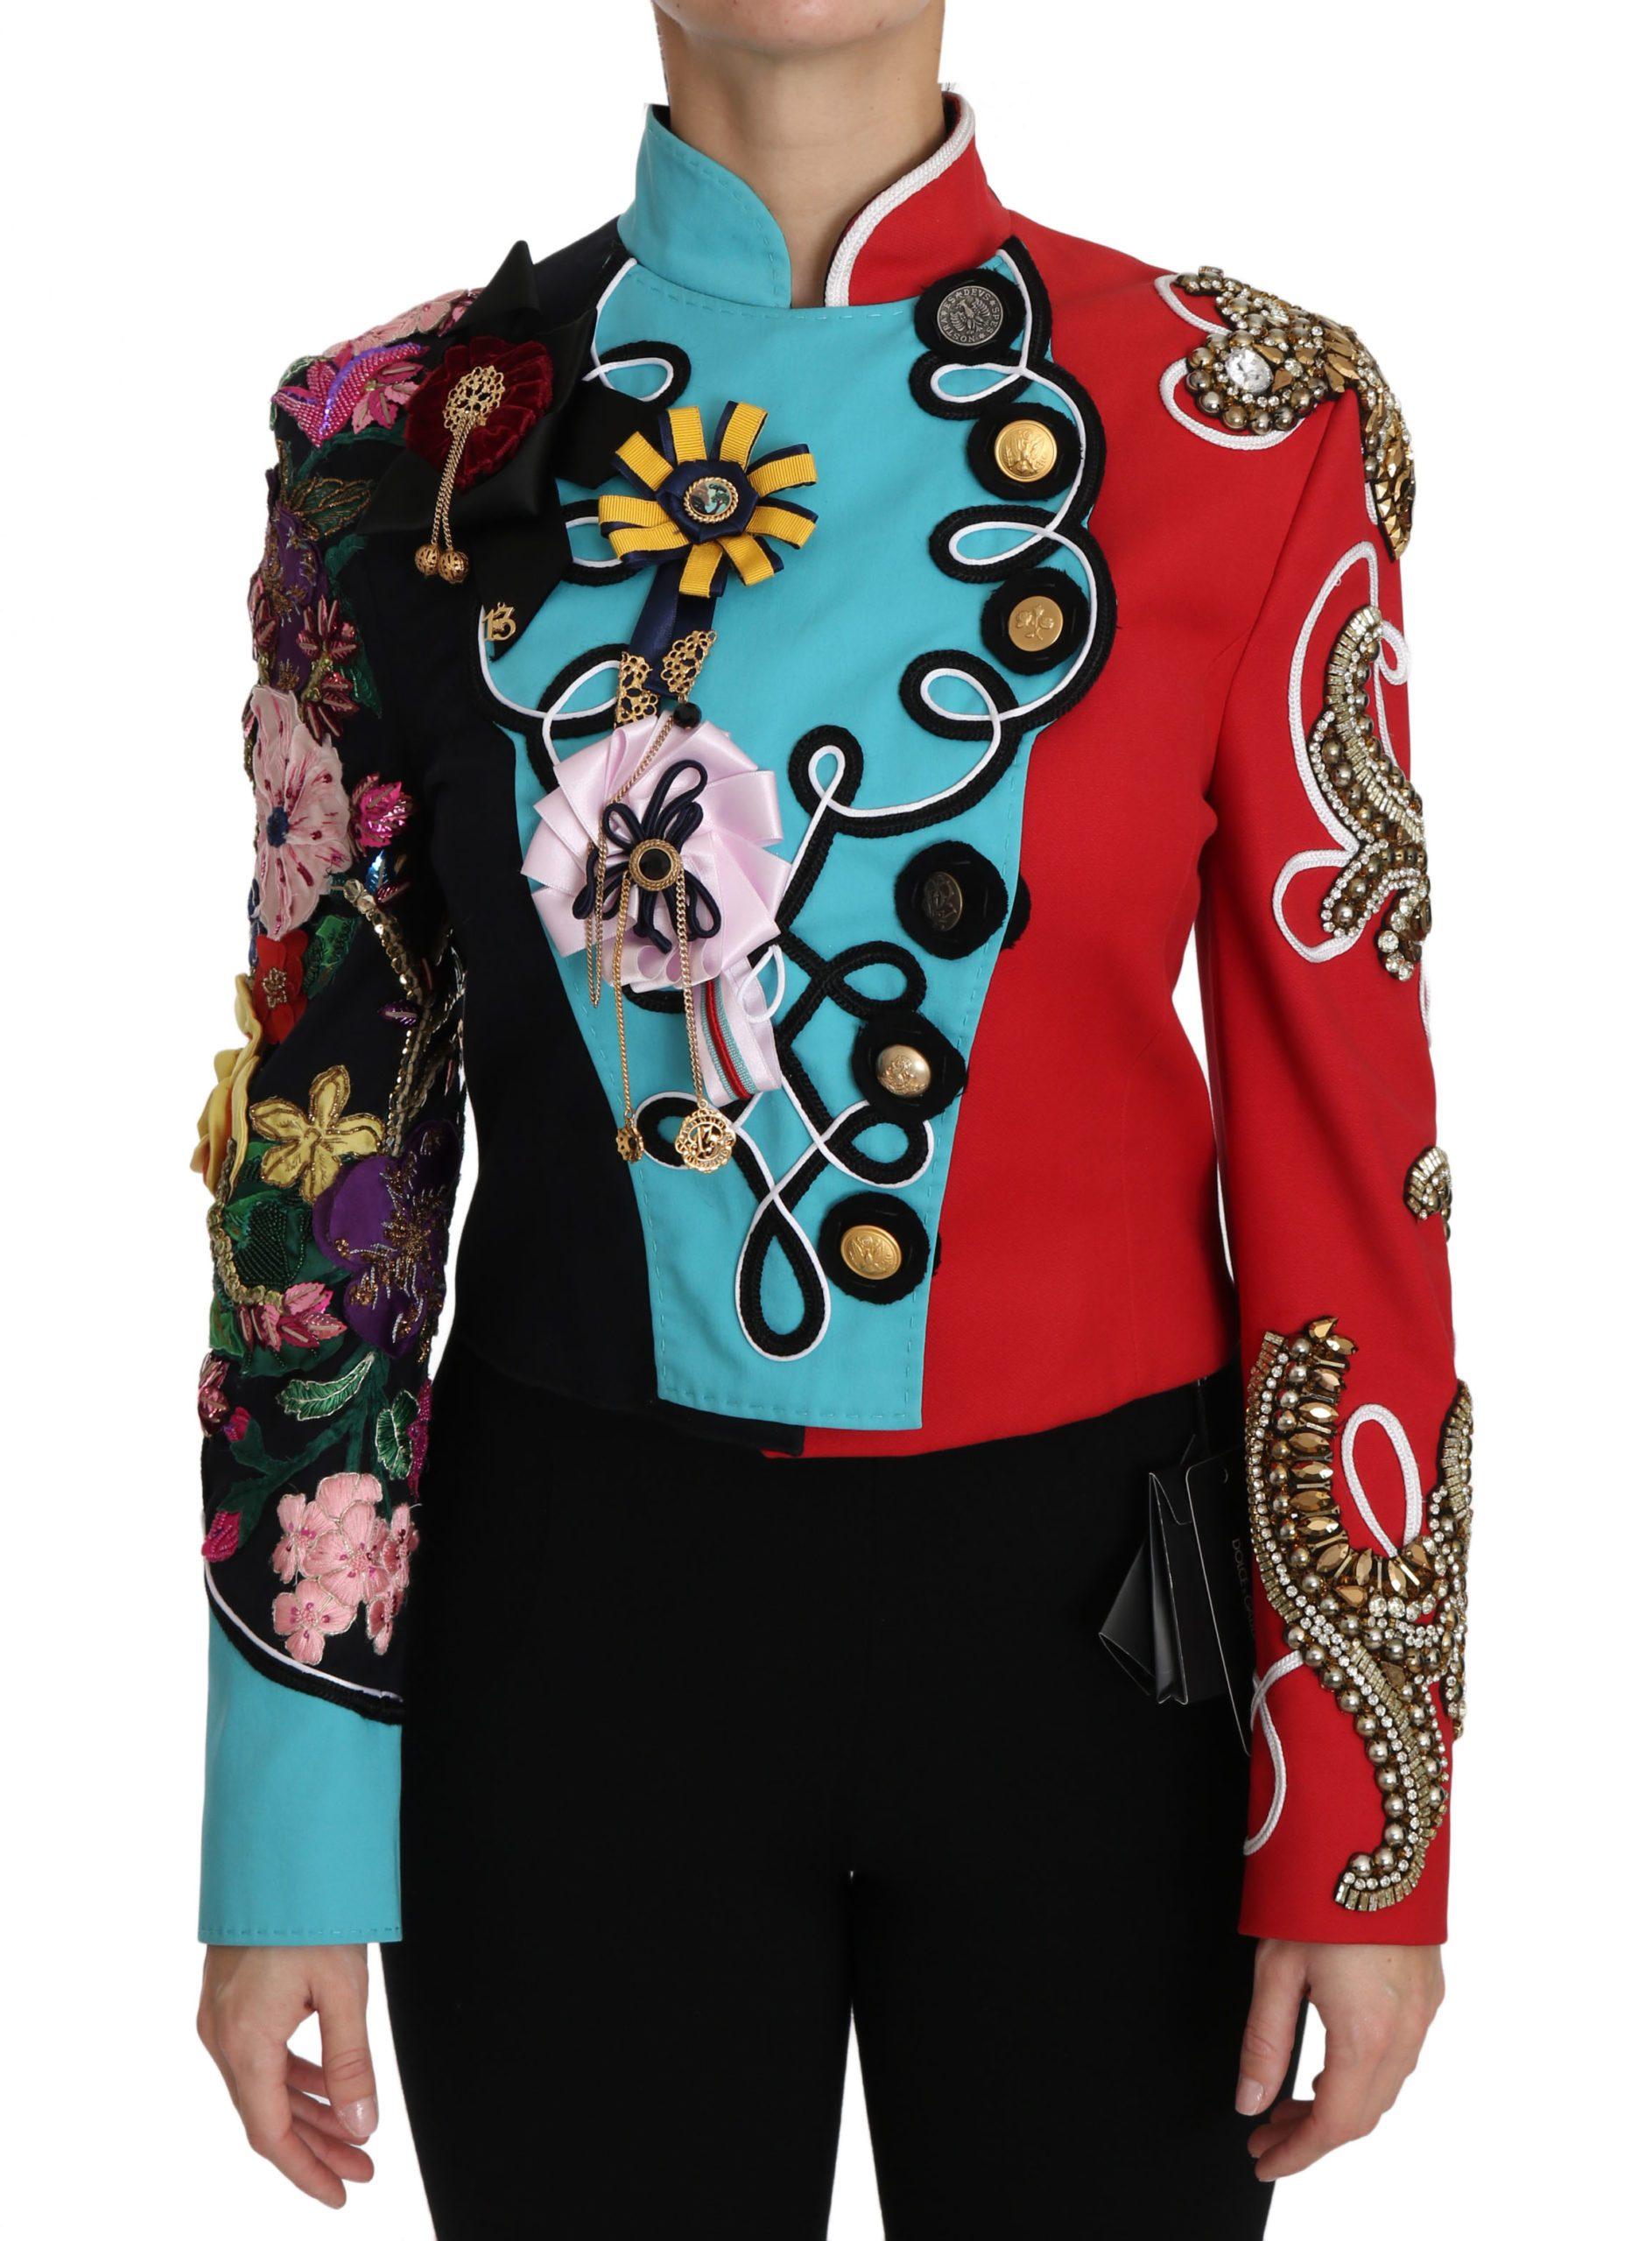 Dolce & Gabbana Women's Crystal Floral Baroque Sicily Jacket Red JKT2411 - IT38 | S